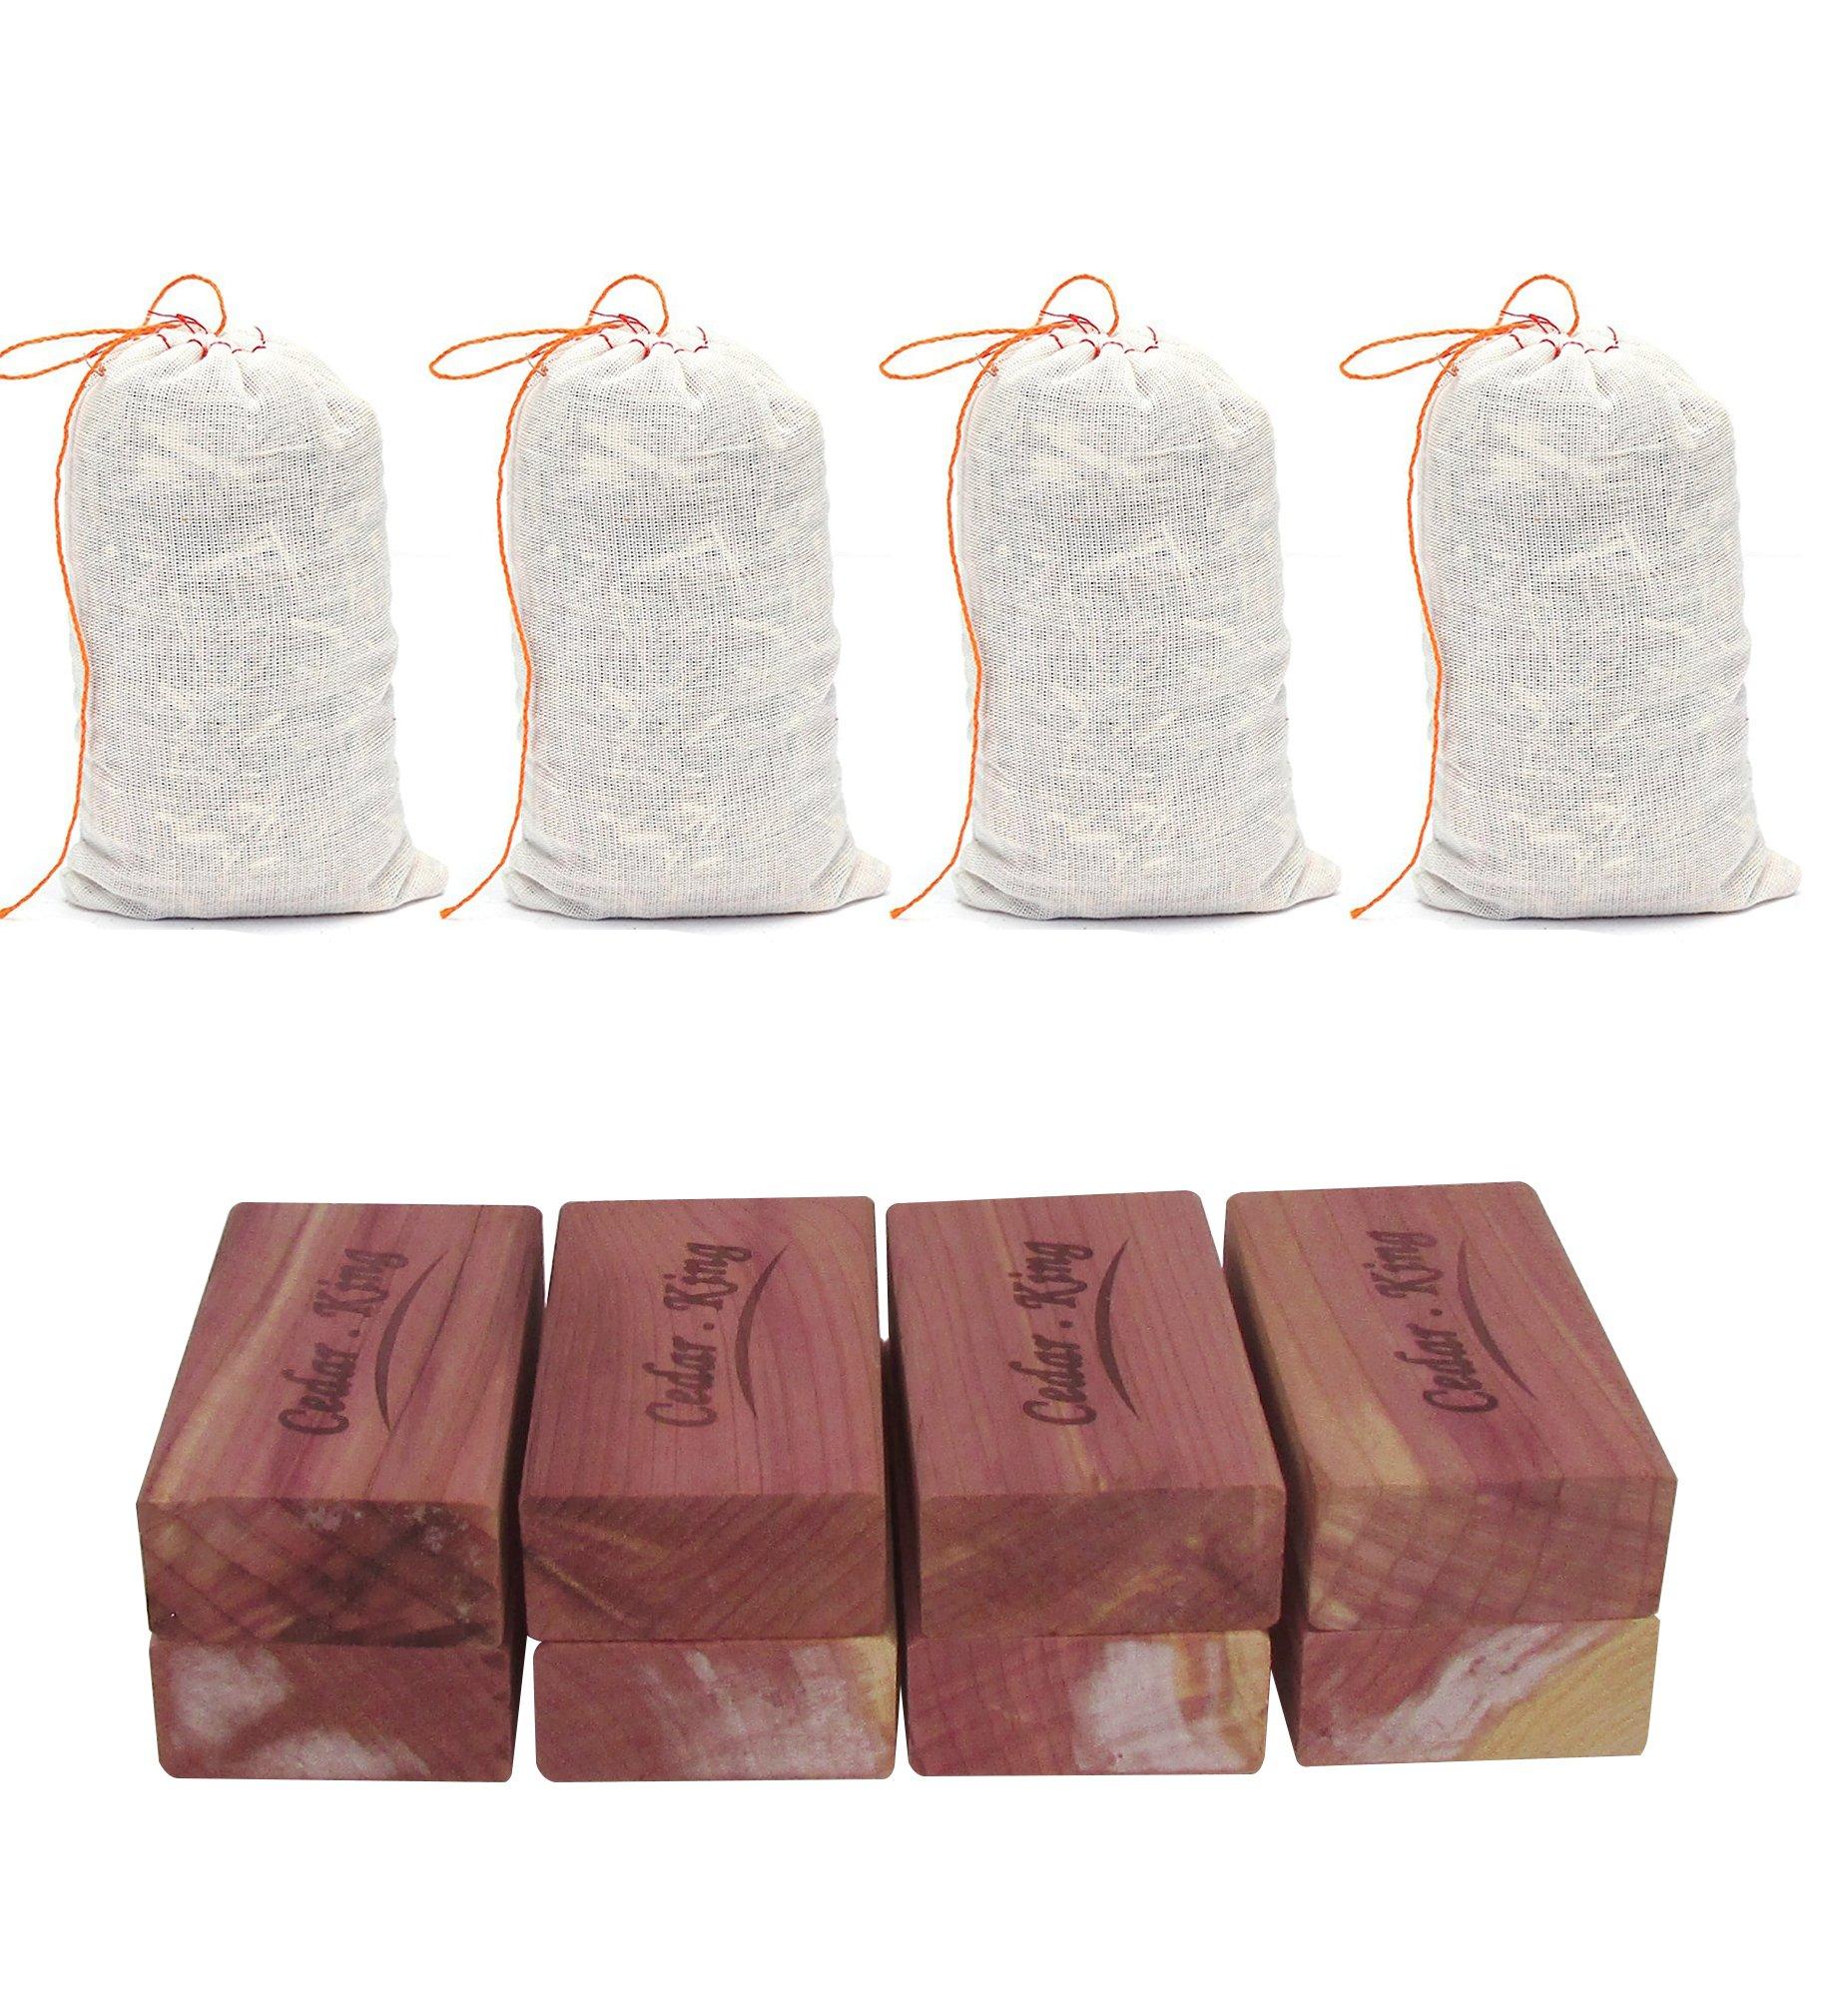 Closet Essentials Cedar King blocks Insect And Moth Repellent Closet and Drawer Storage Protector 1- Box (8 Blocks and 4 cedar sachet Bags)